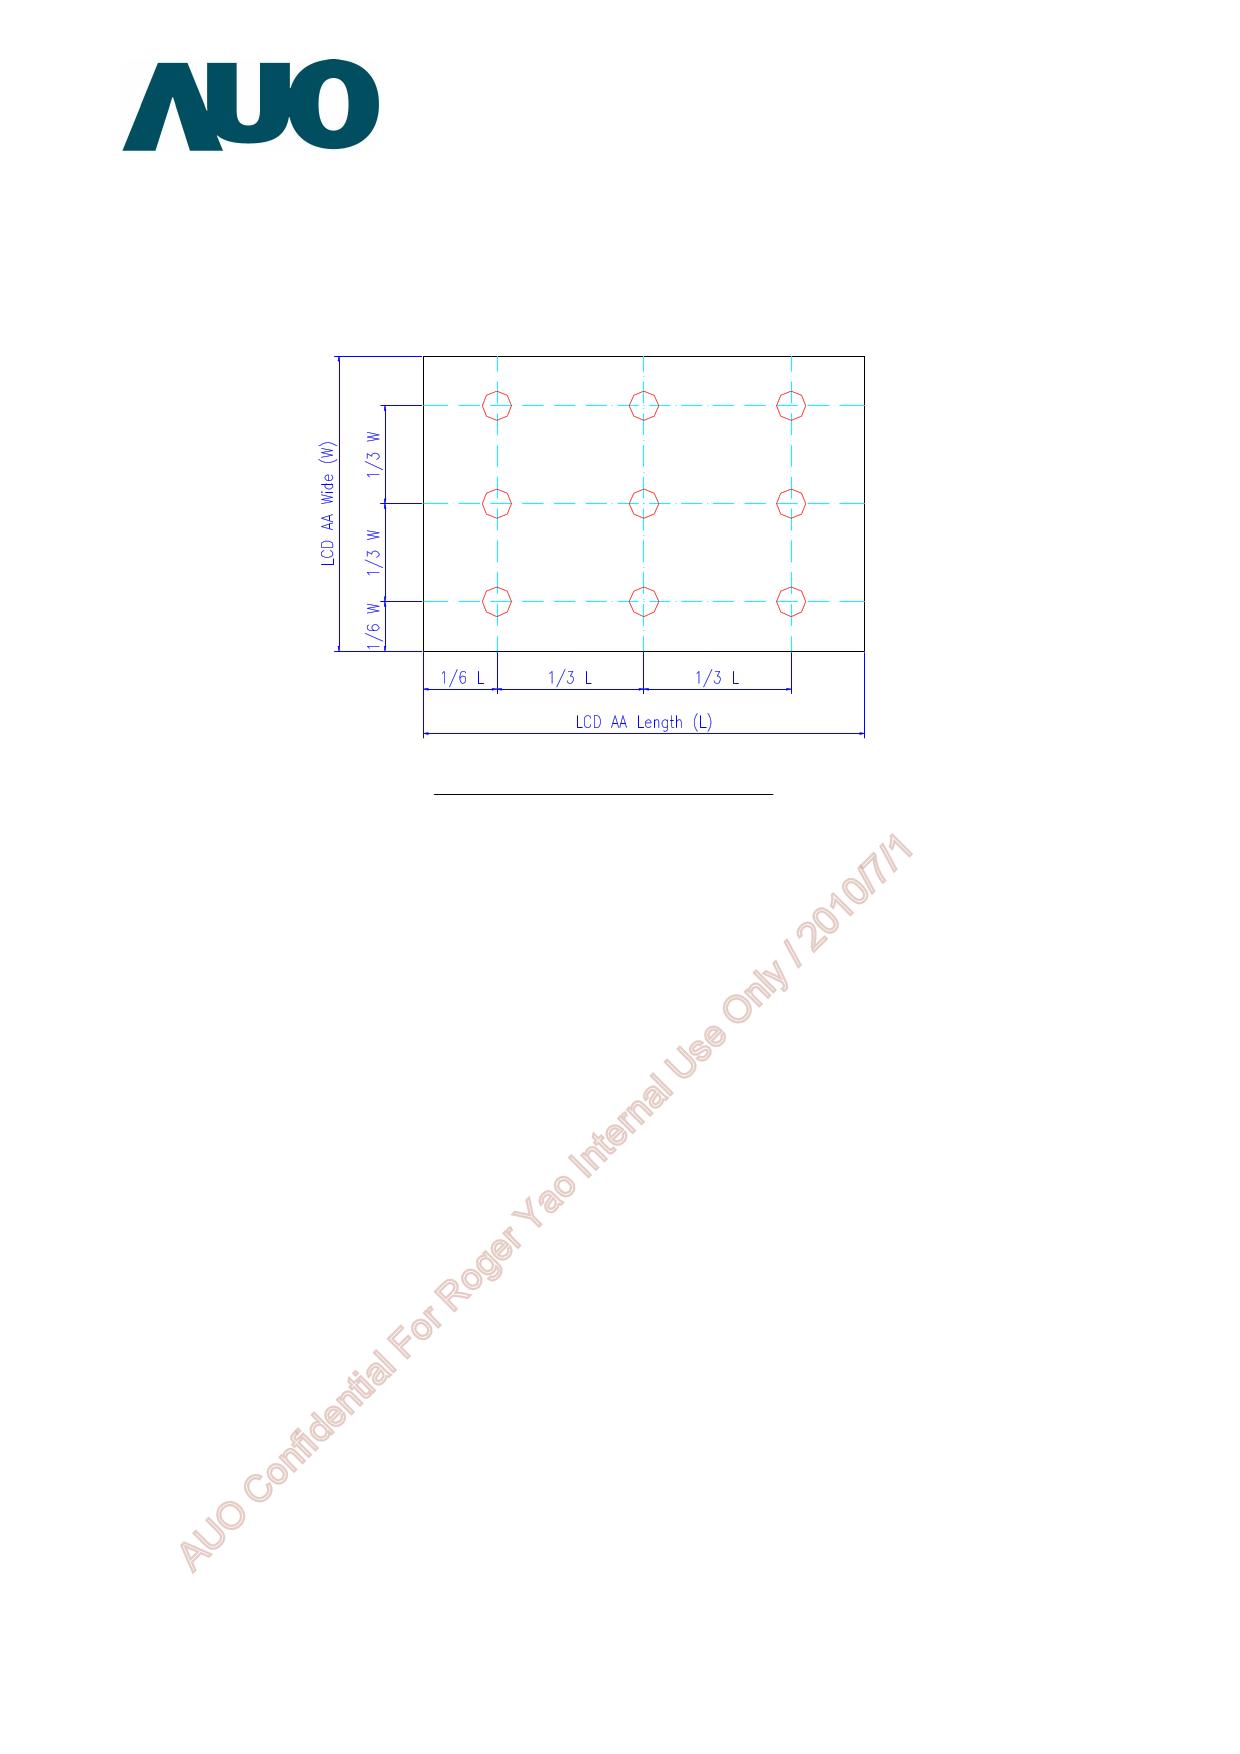 A070VW08-V0 transistor, igbt